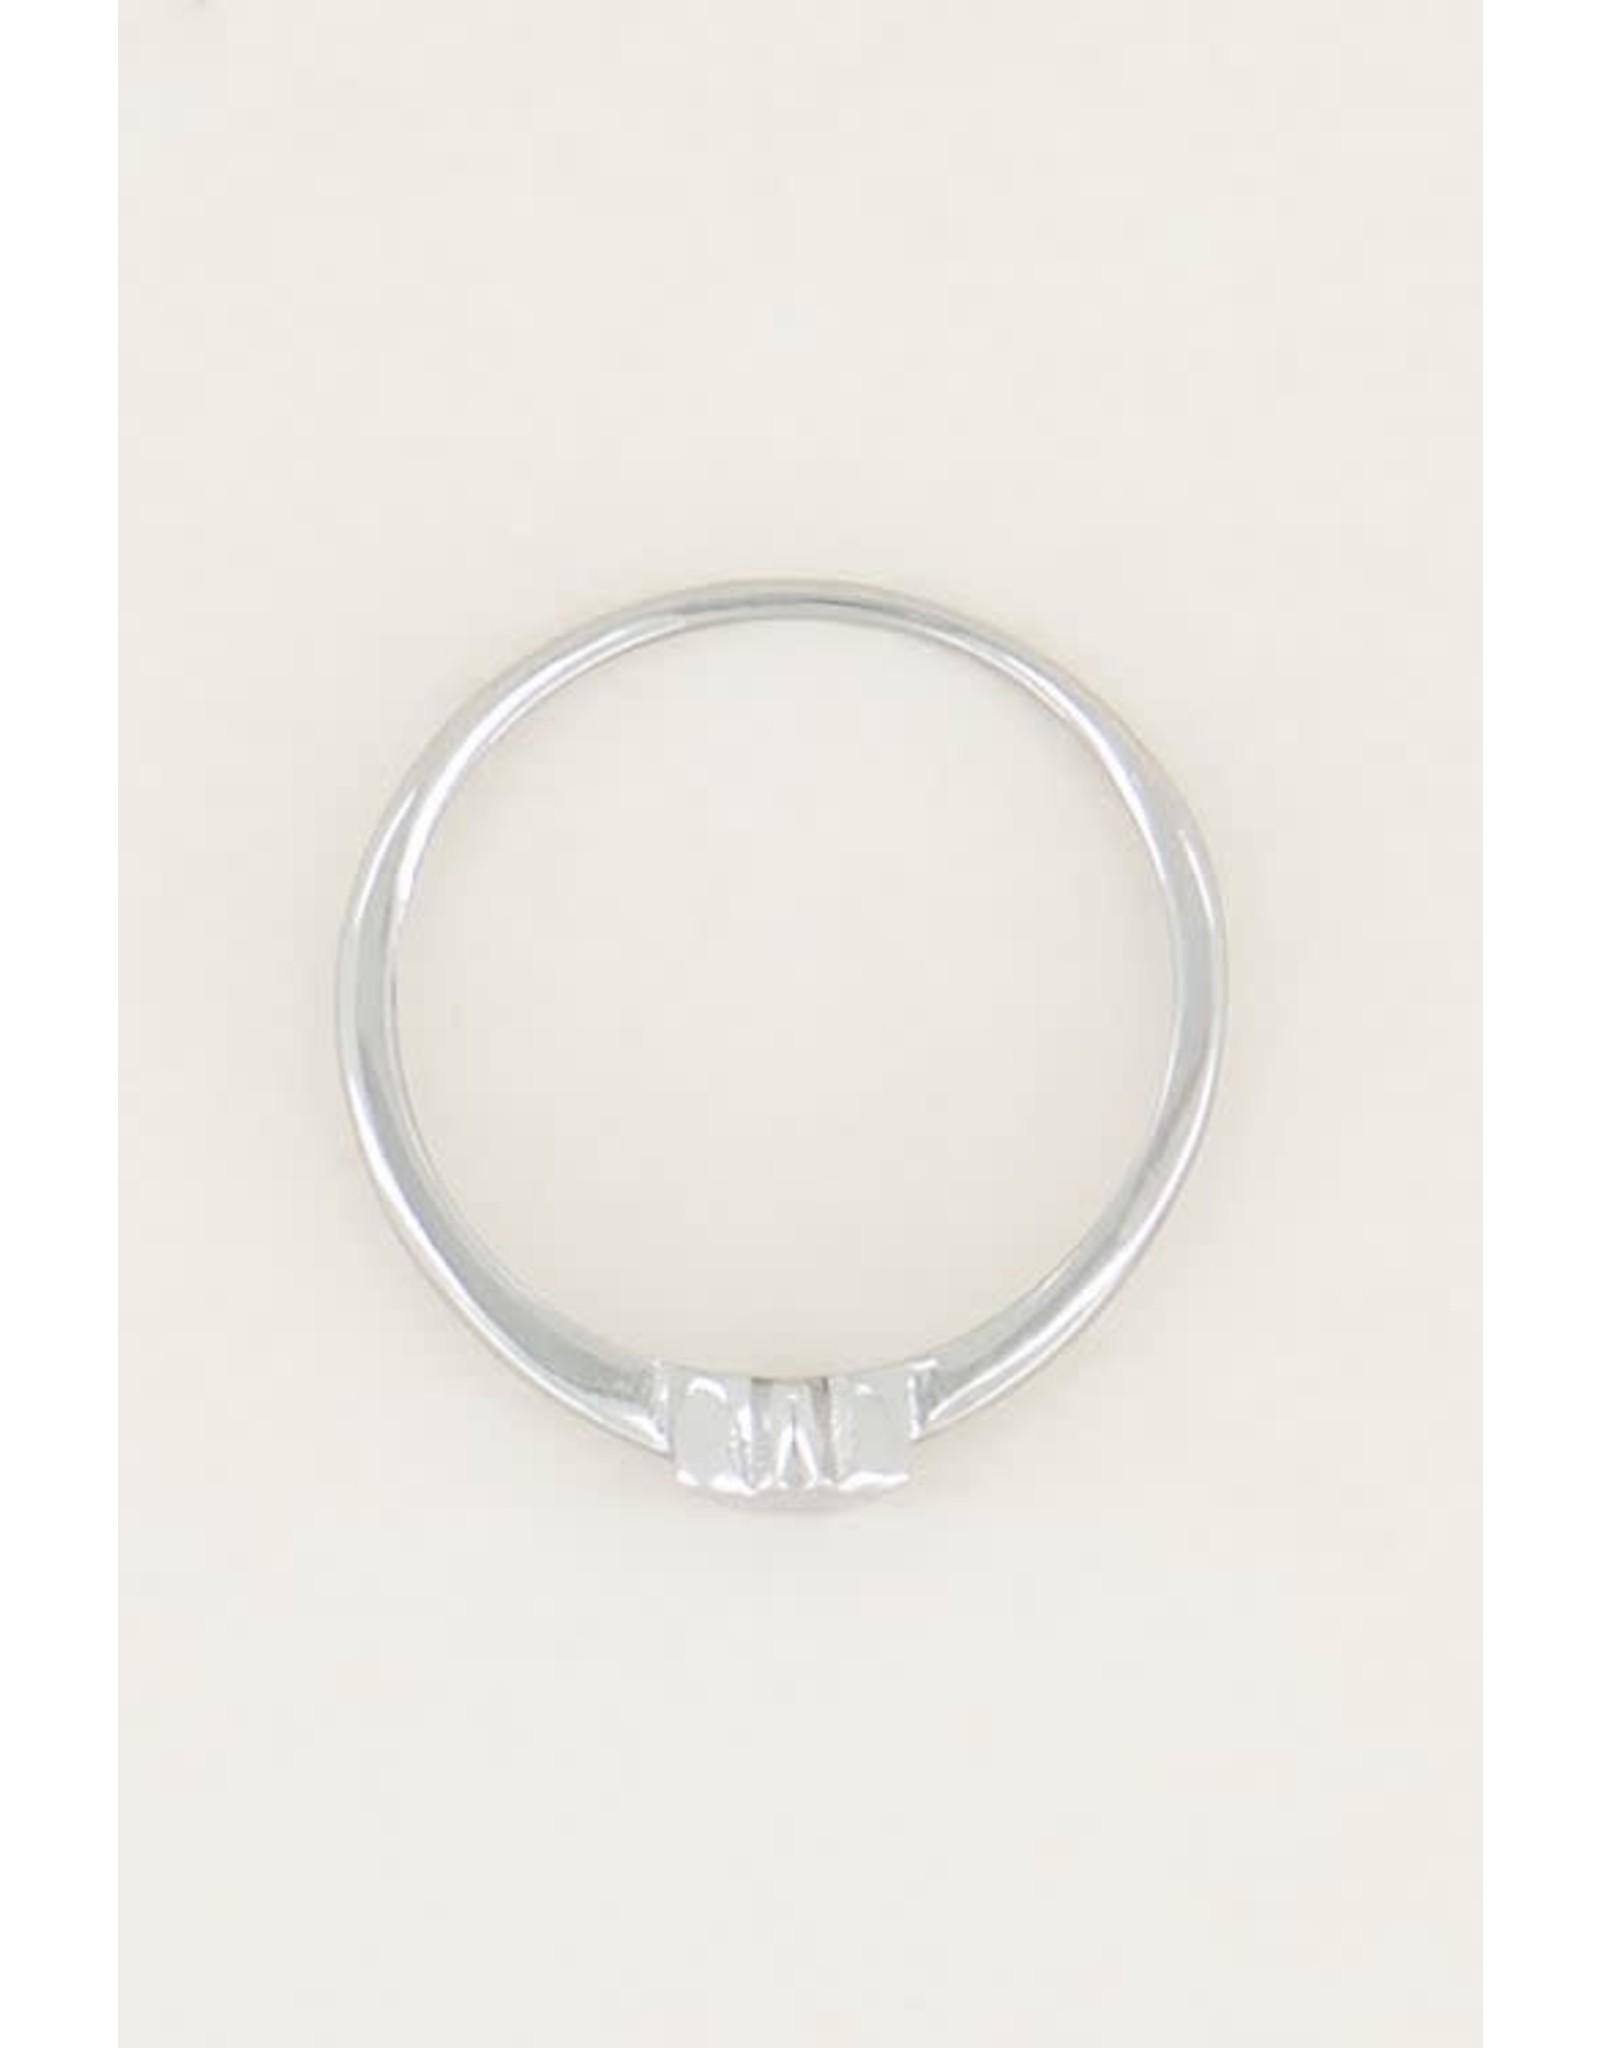 My Jewellery My Jewellery ring sterretje zilver